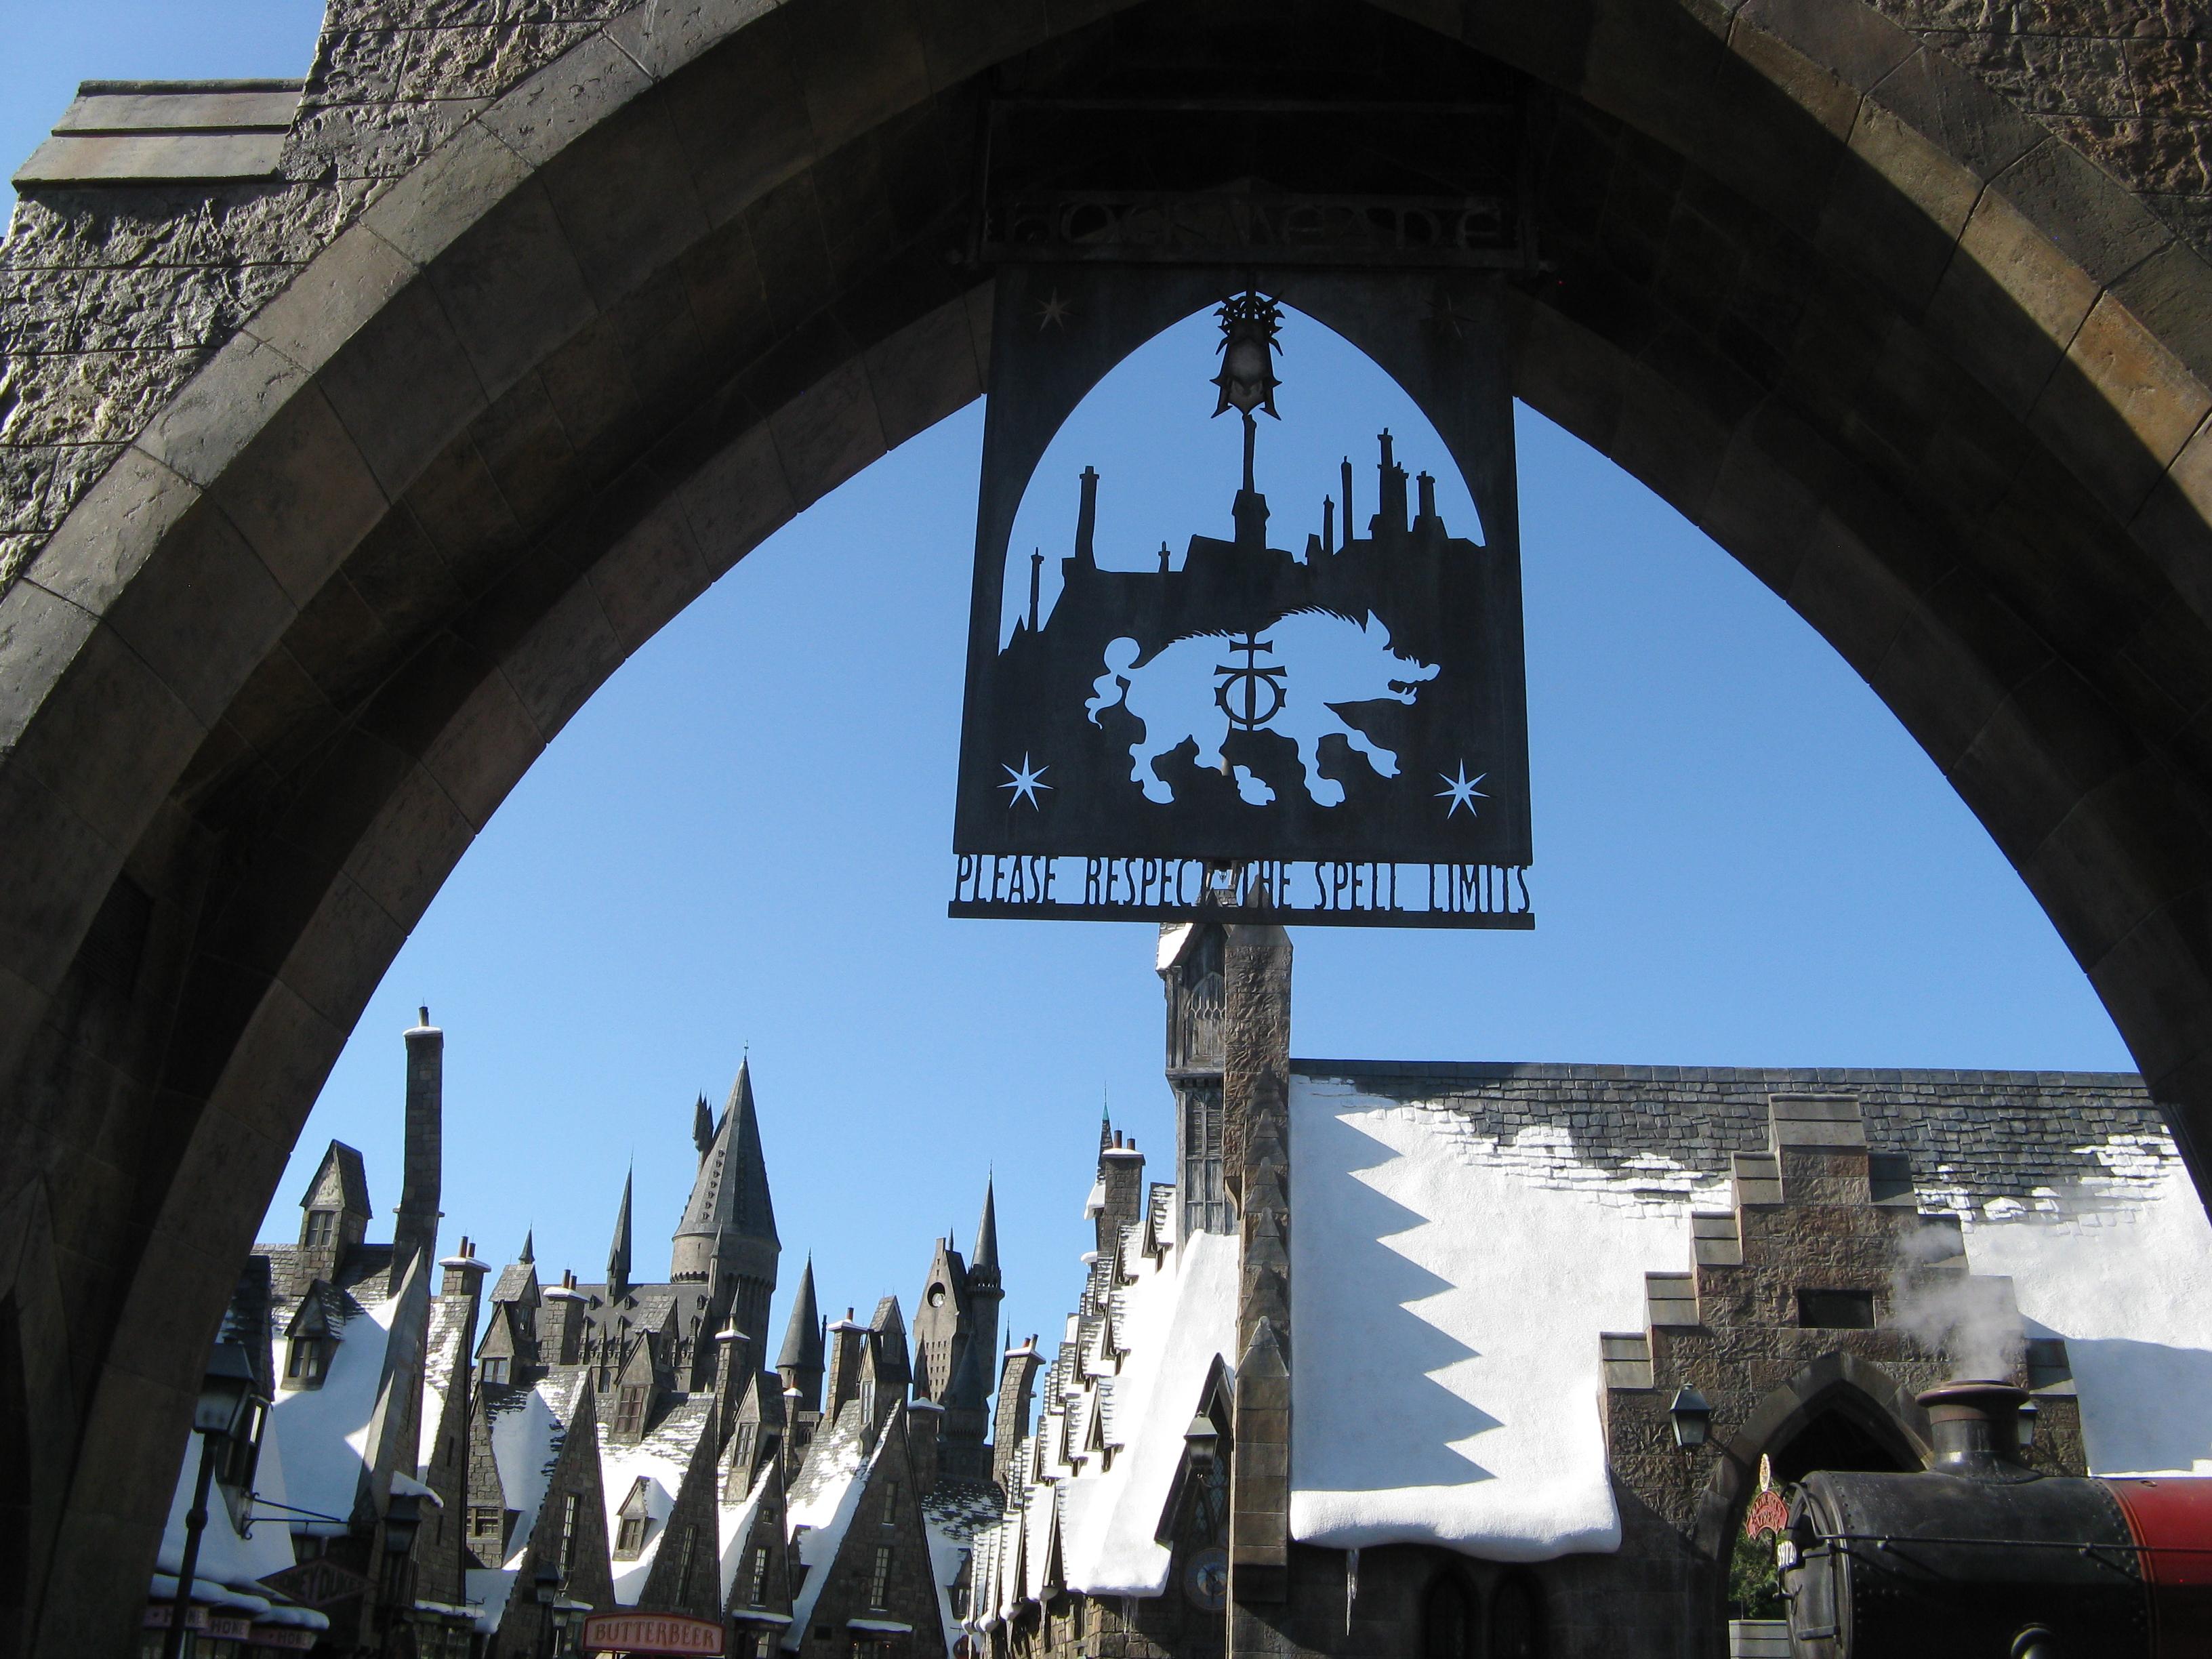 USA: Thrill Rides in Florida's Disney World & Universal